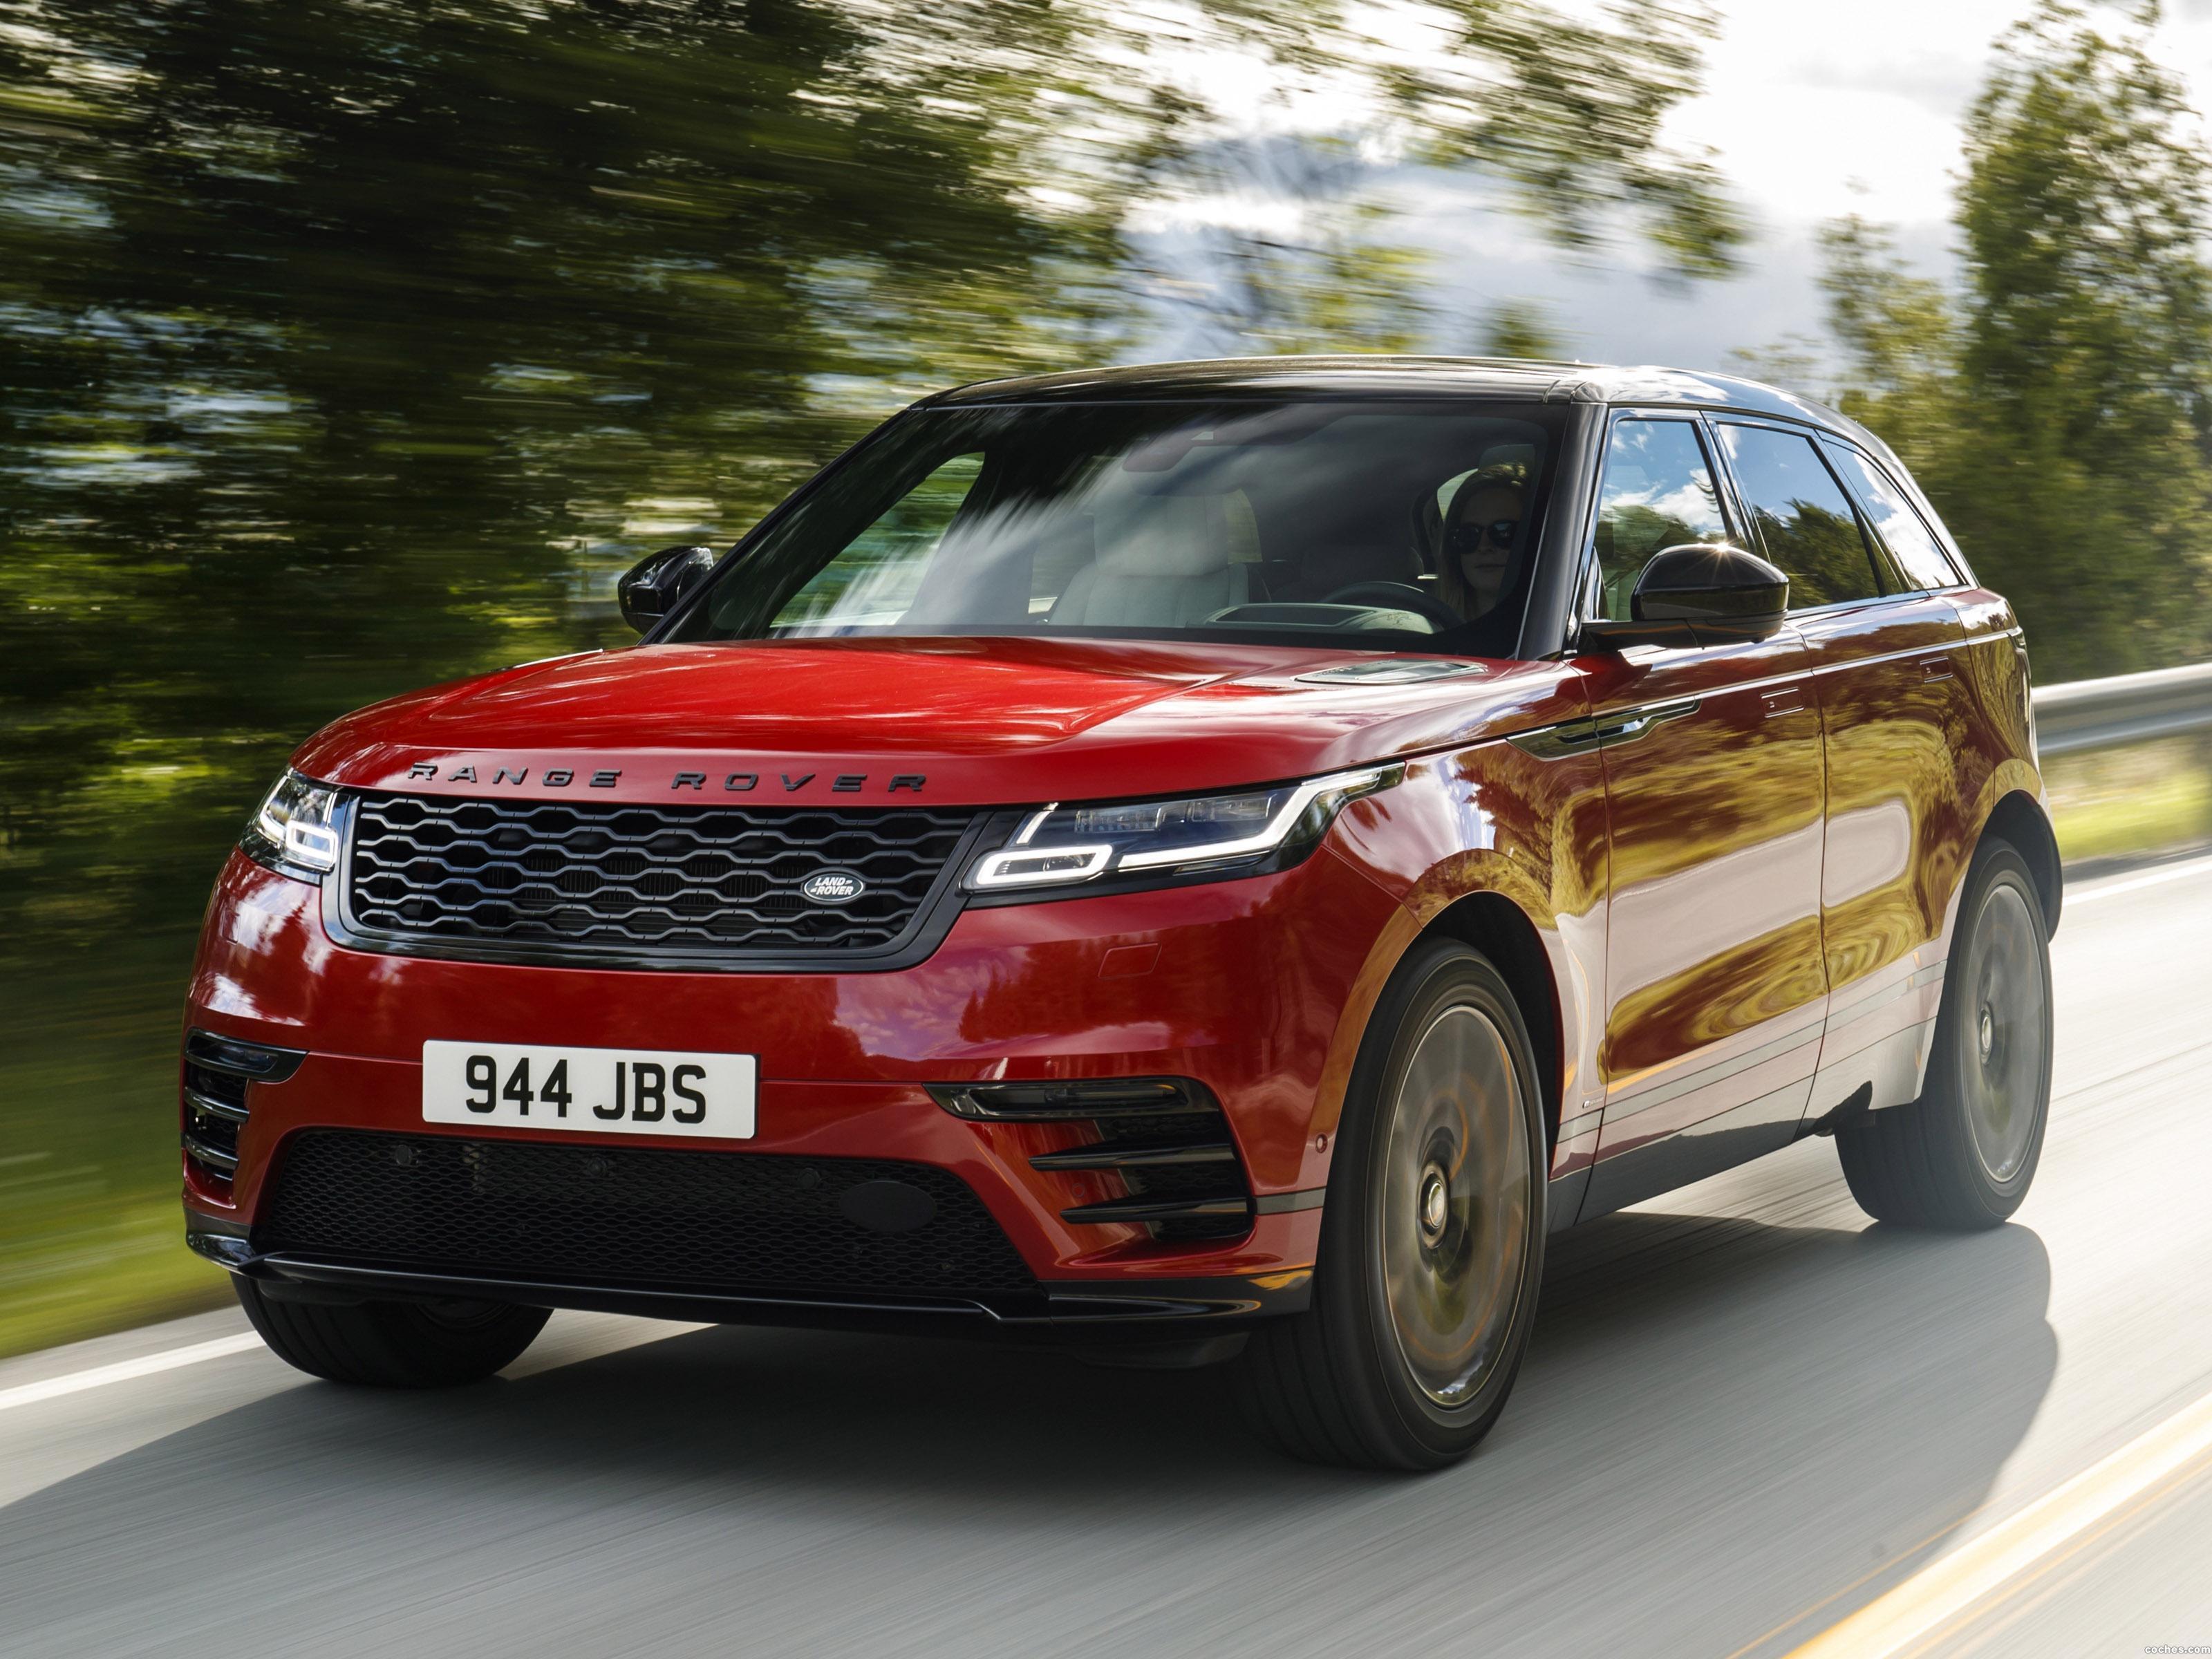 Foto 0 de Land Rover Range Rover Velar R-Dynamic D300 HSE Black Pack 2017